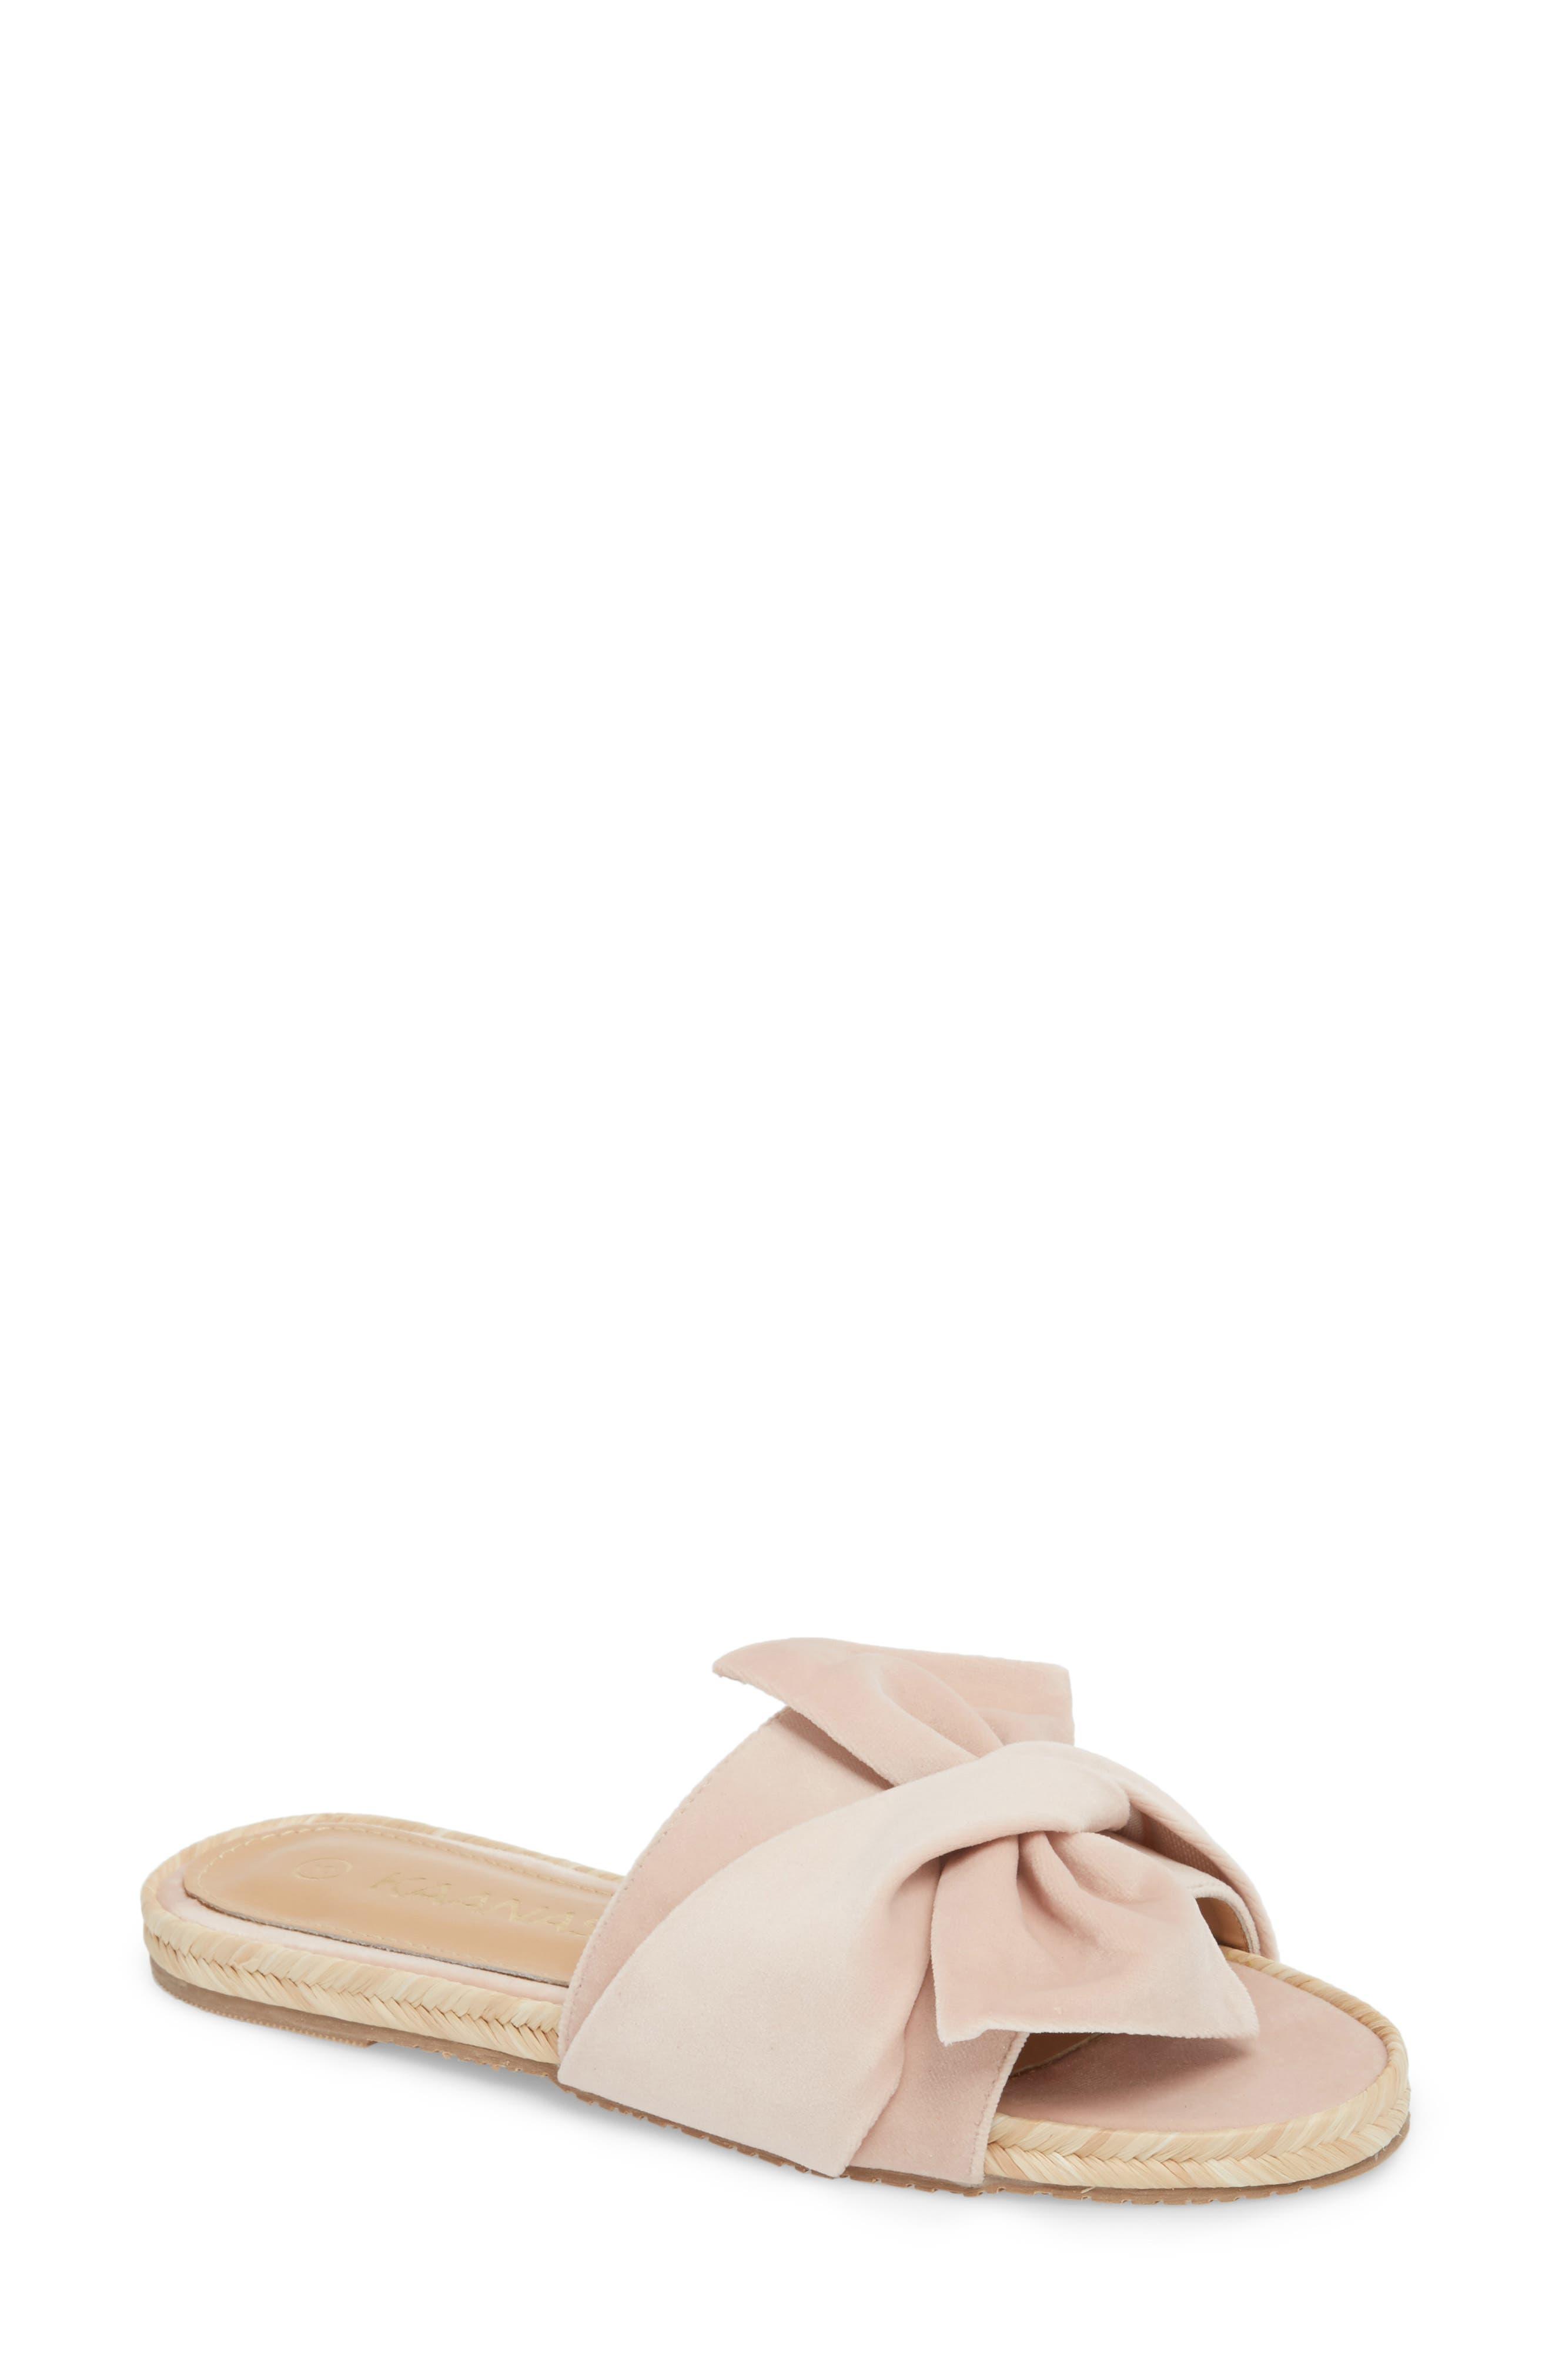 Sausalito Knotted Slide Sandal,                         Main,                         color,